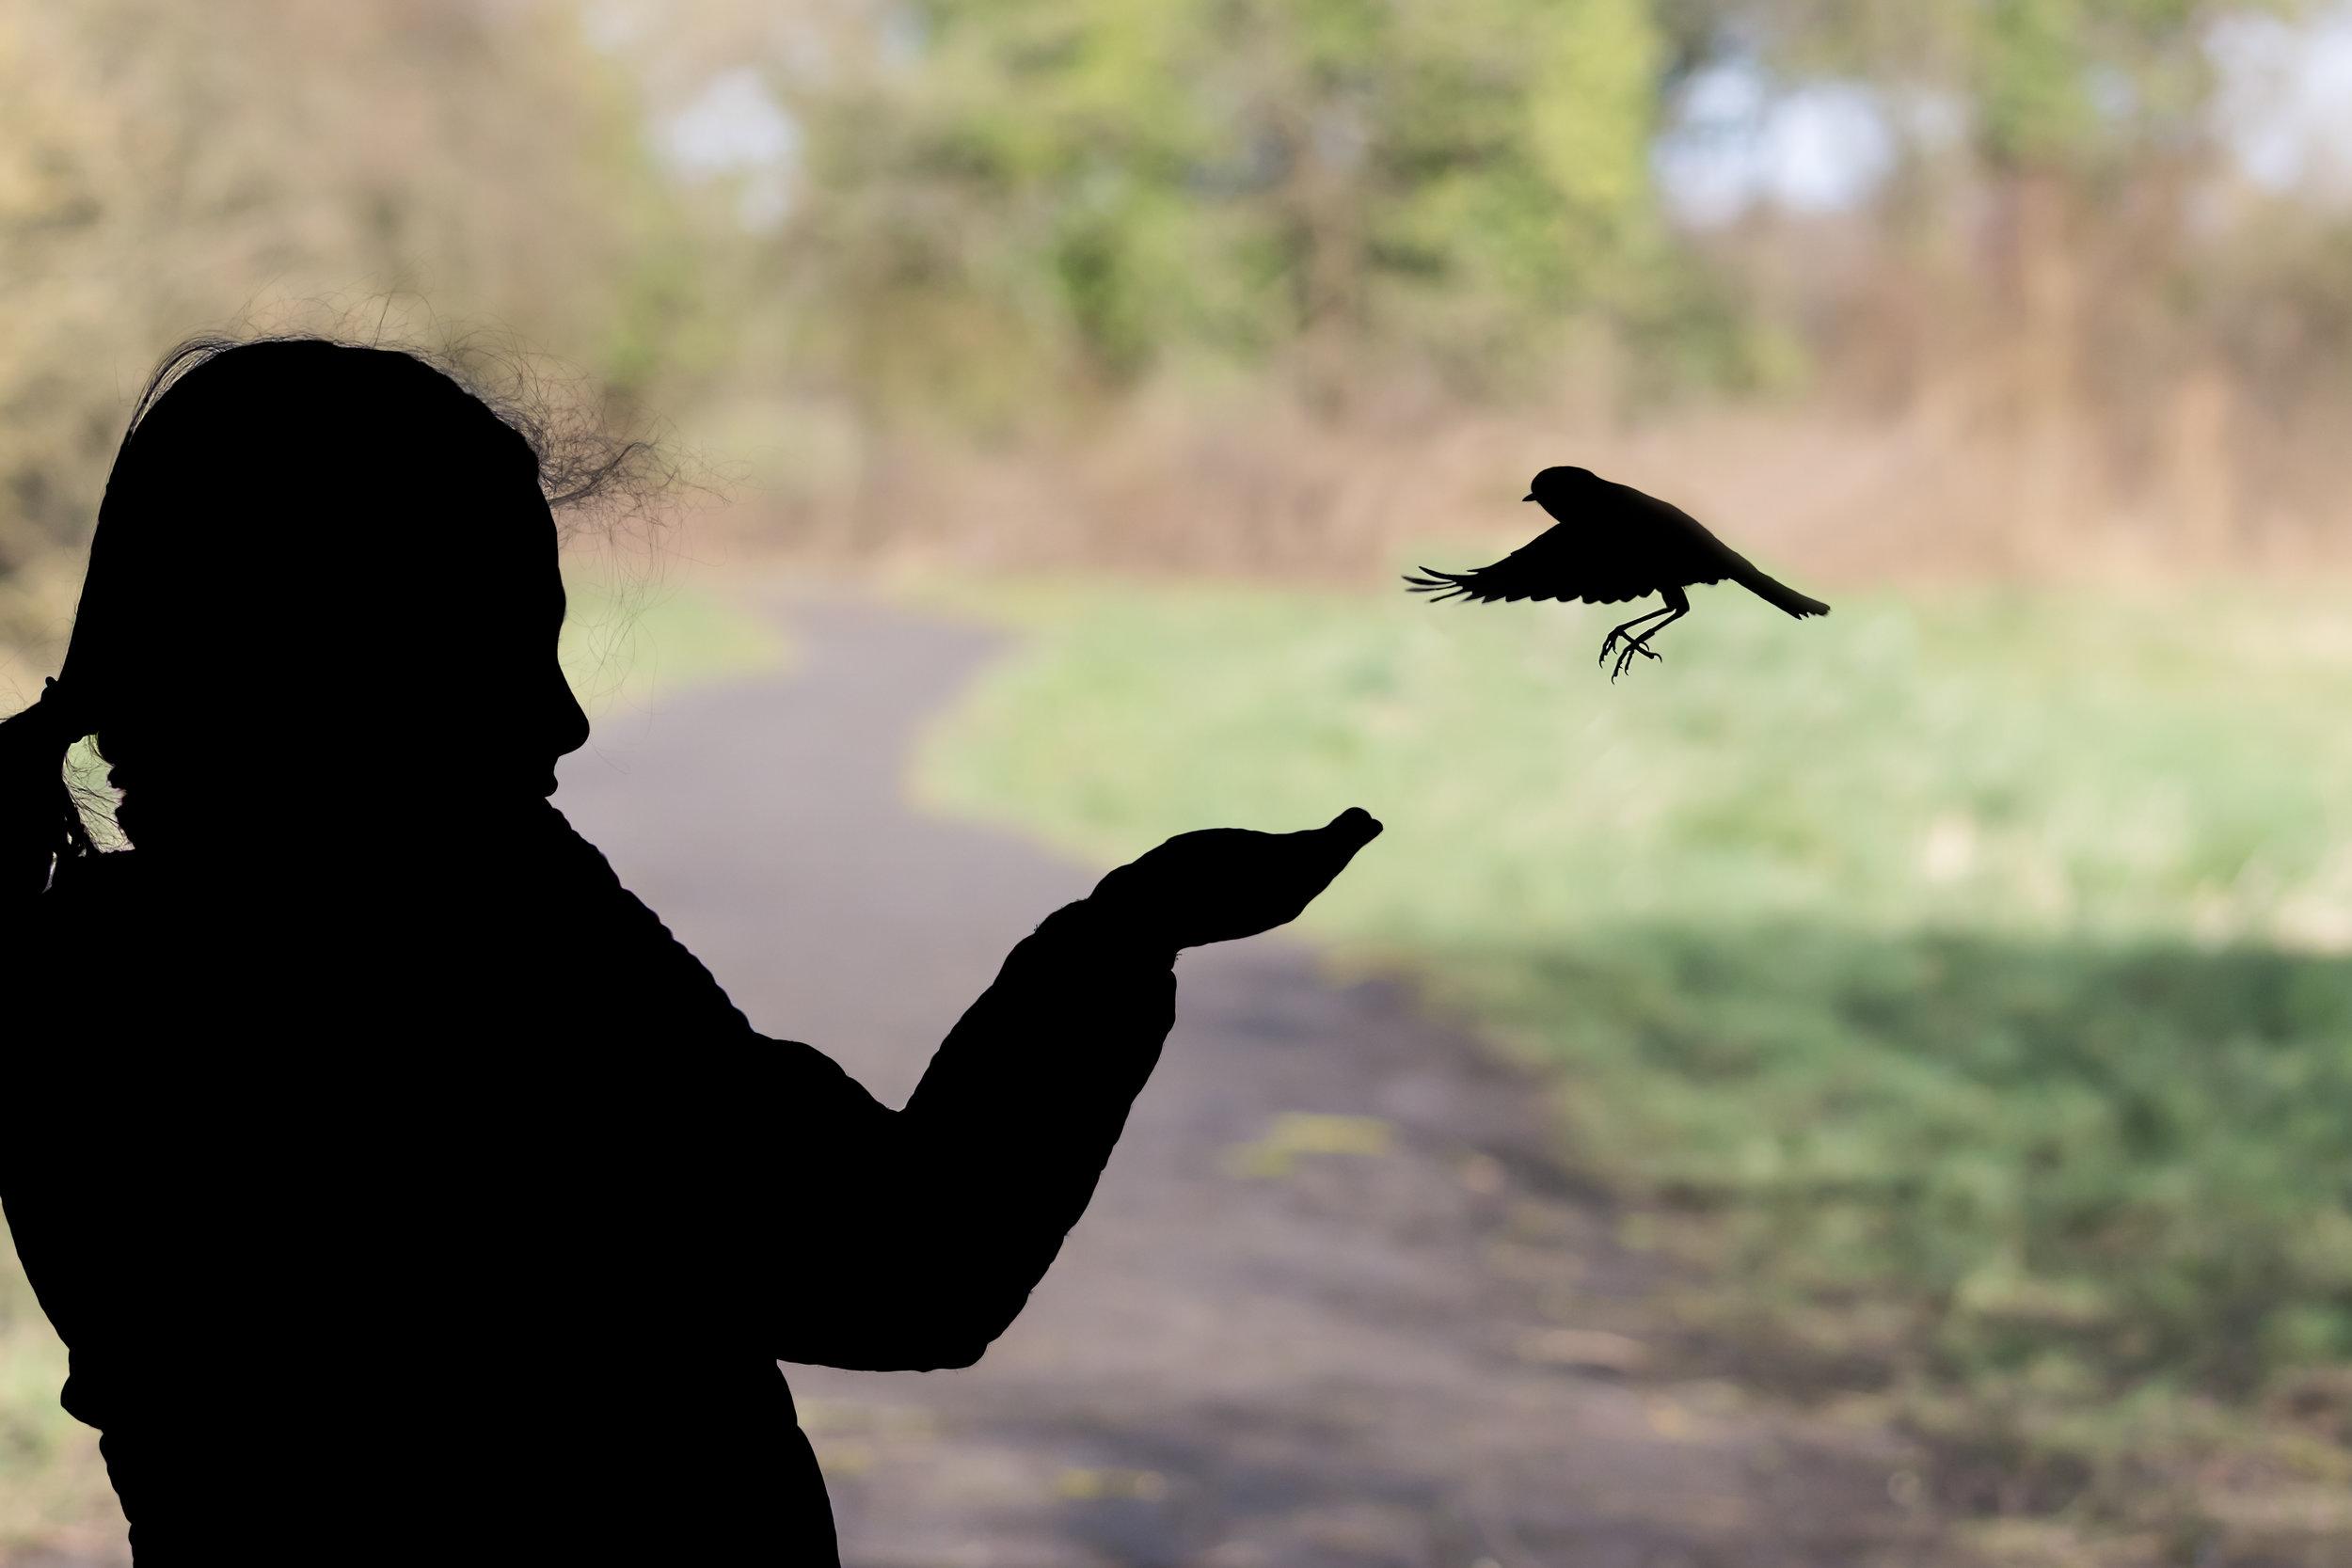 Feeding the Robins at RSPB Middleton Lakes